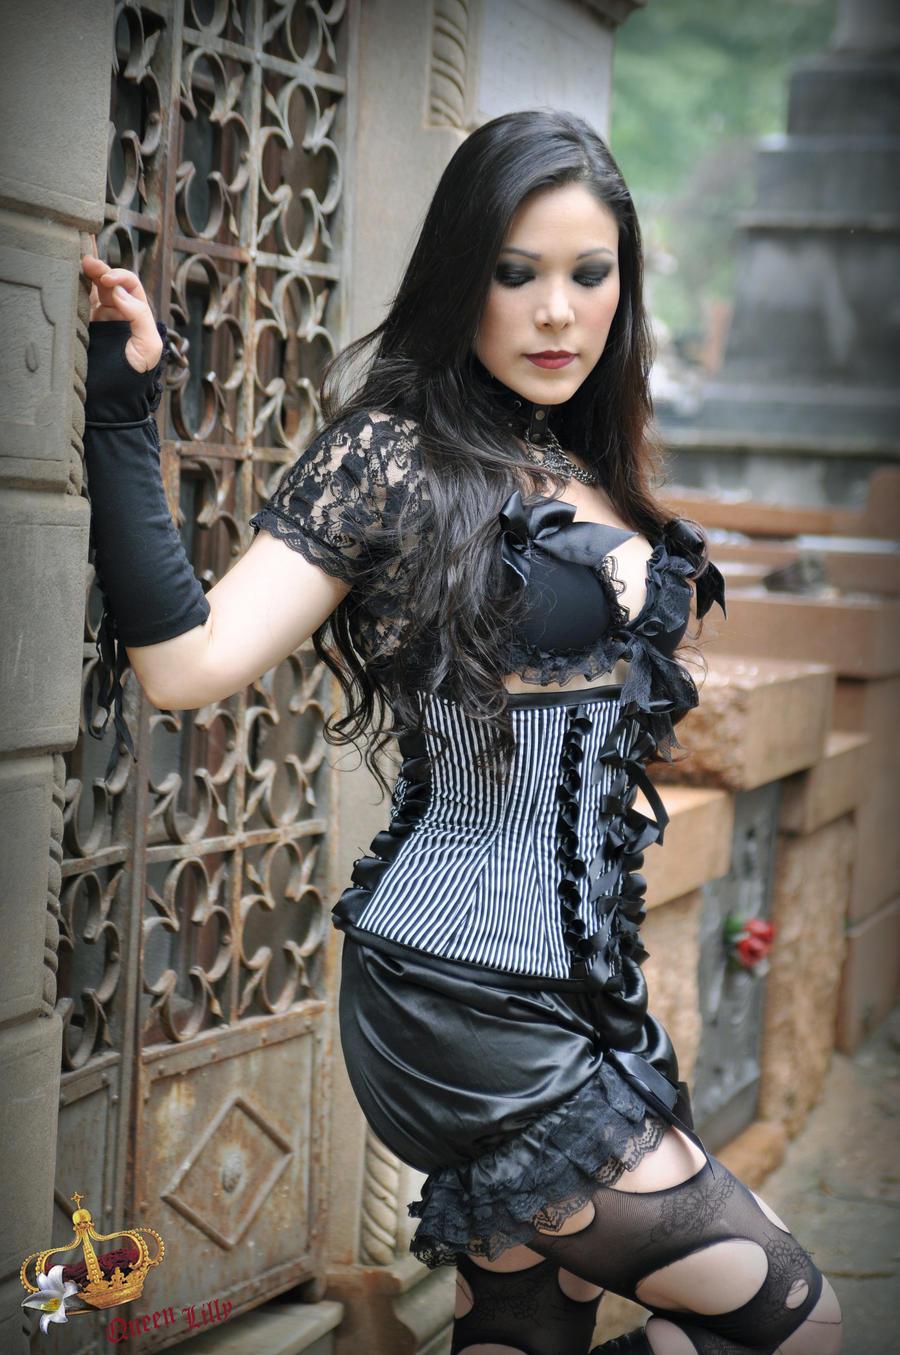 Goth models videos galleries 82